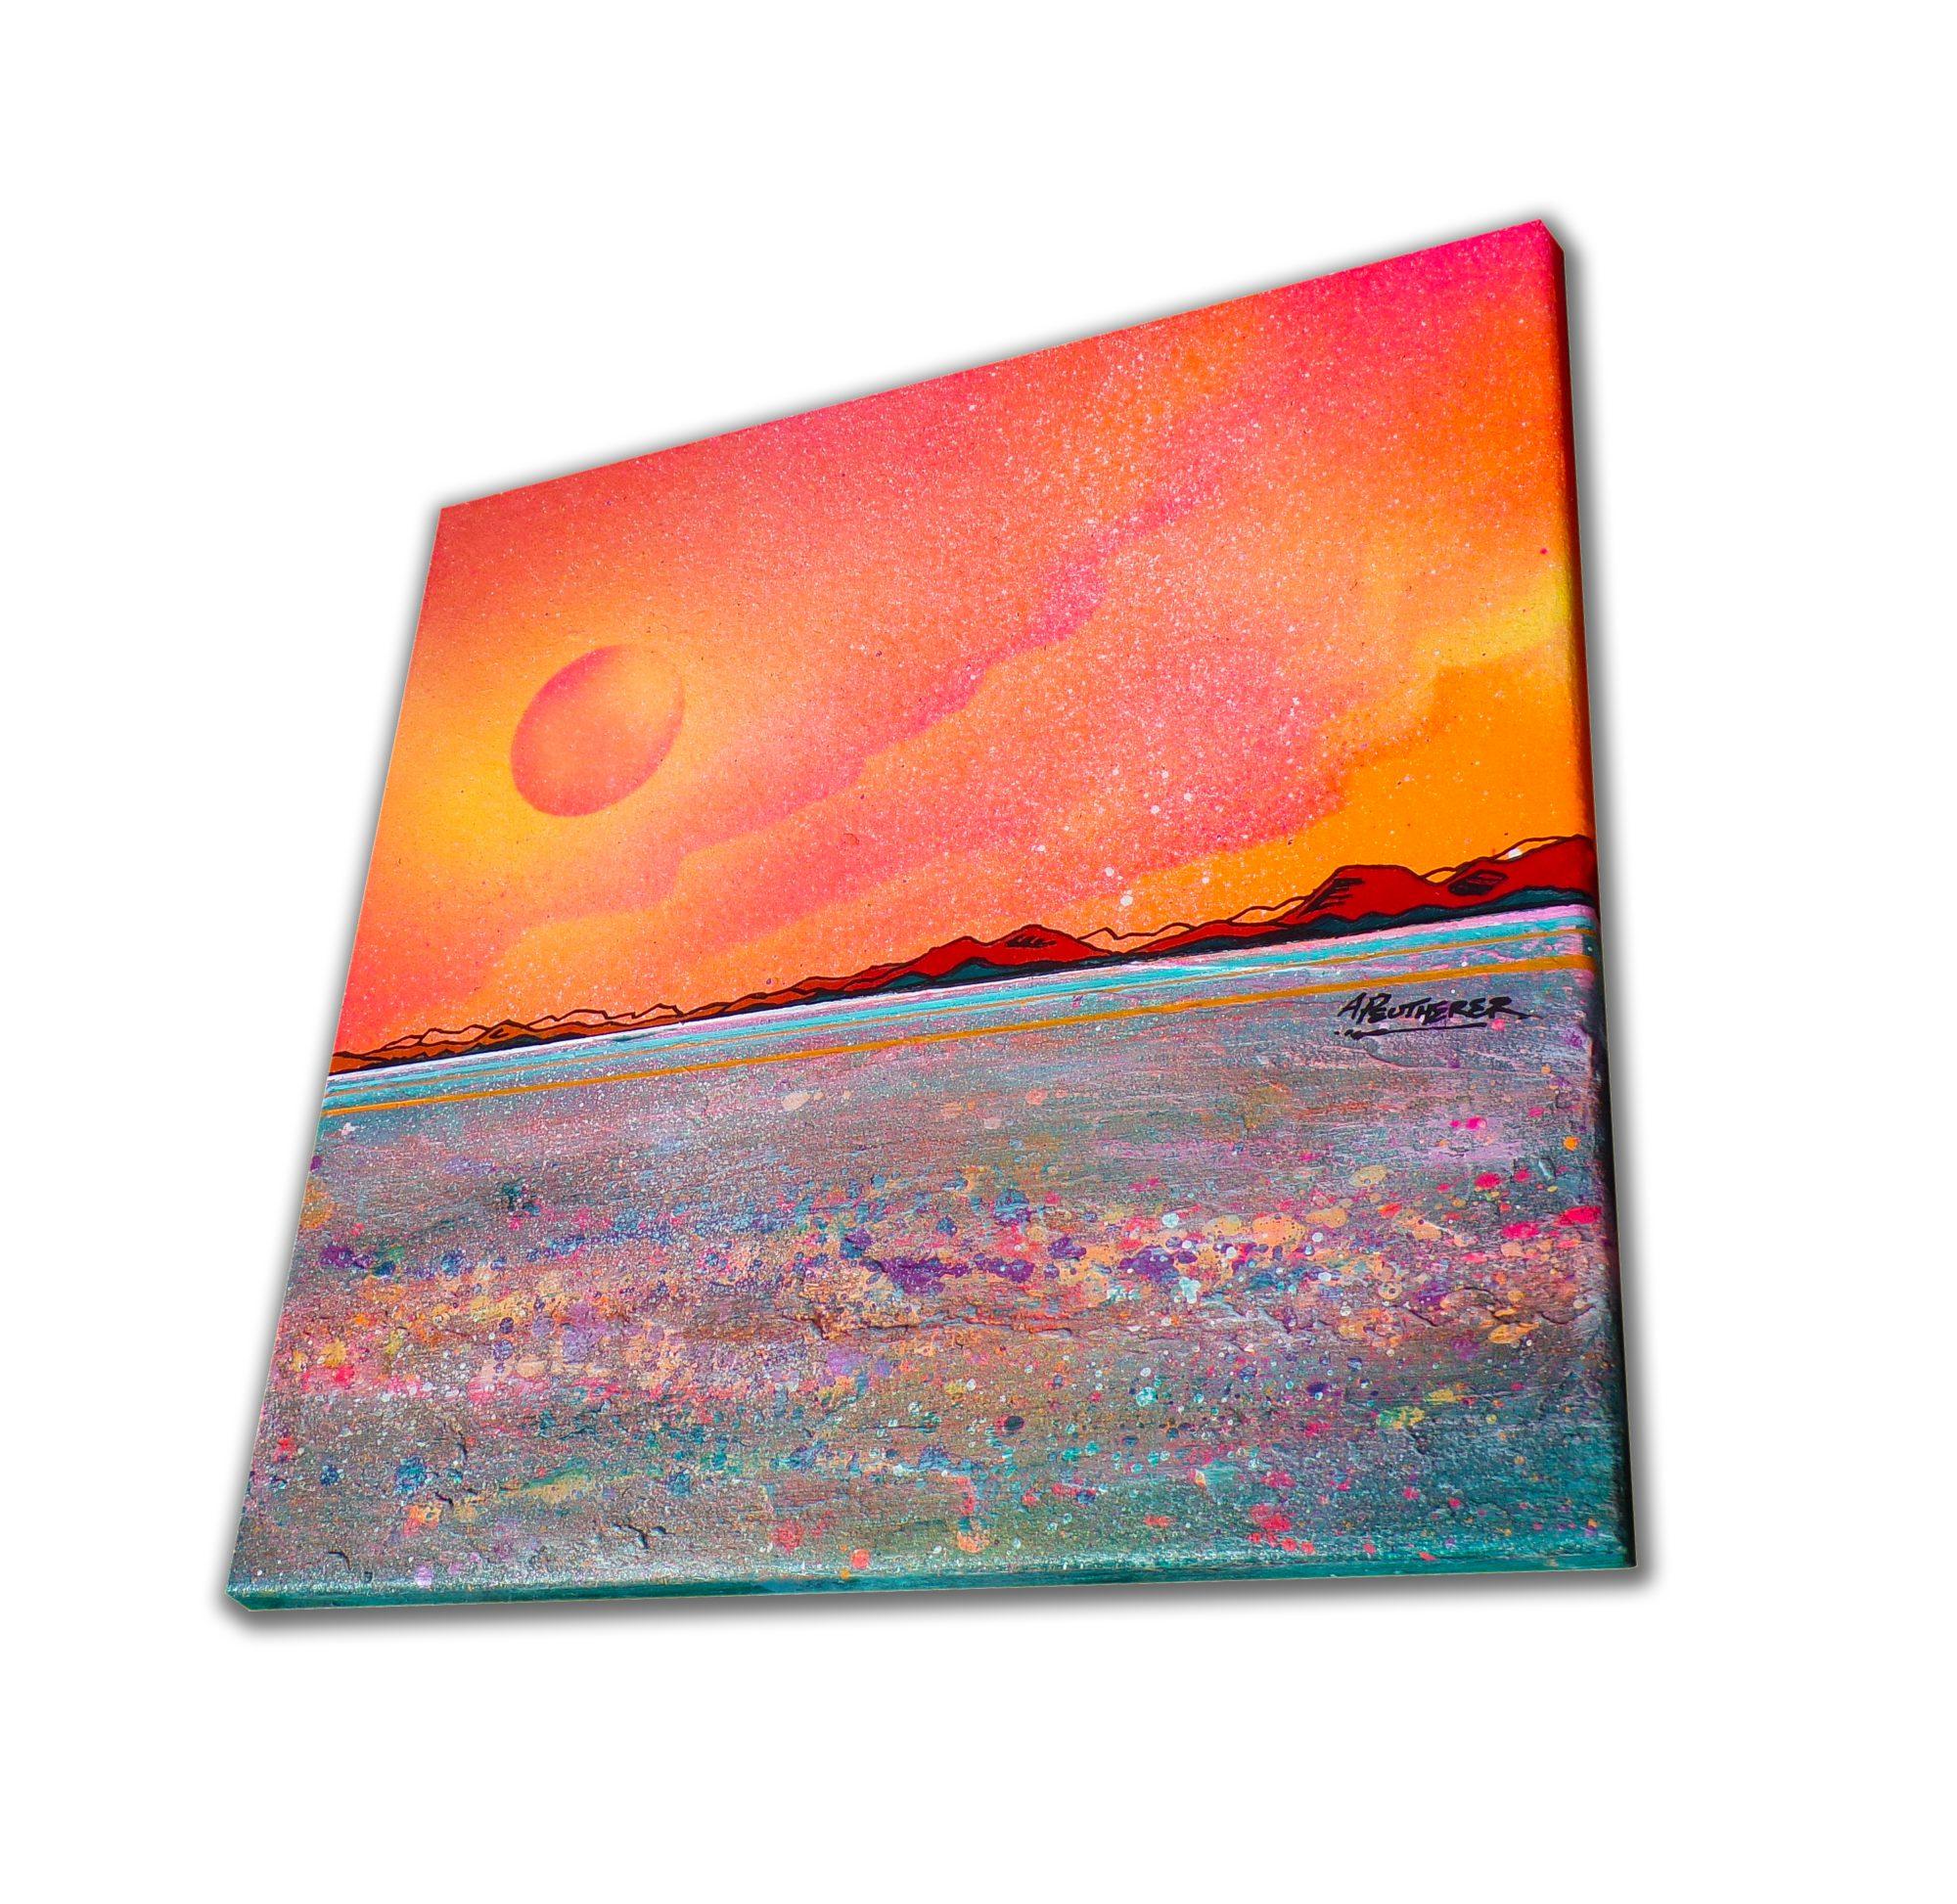 Sanna Bay, Ardnamurchan, Scotland - original Painting Canvas & Art Prints - 3D View